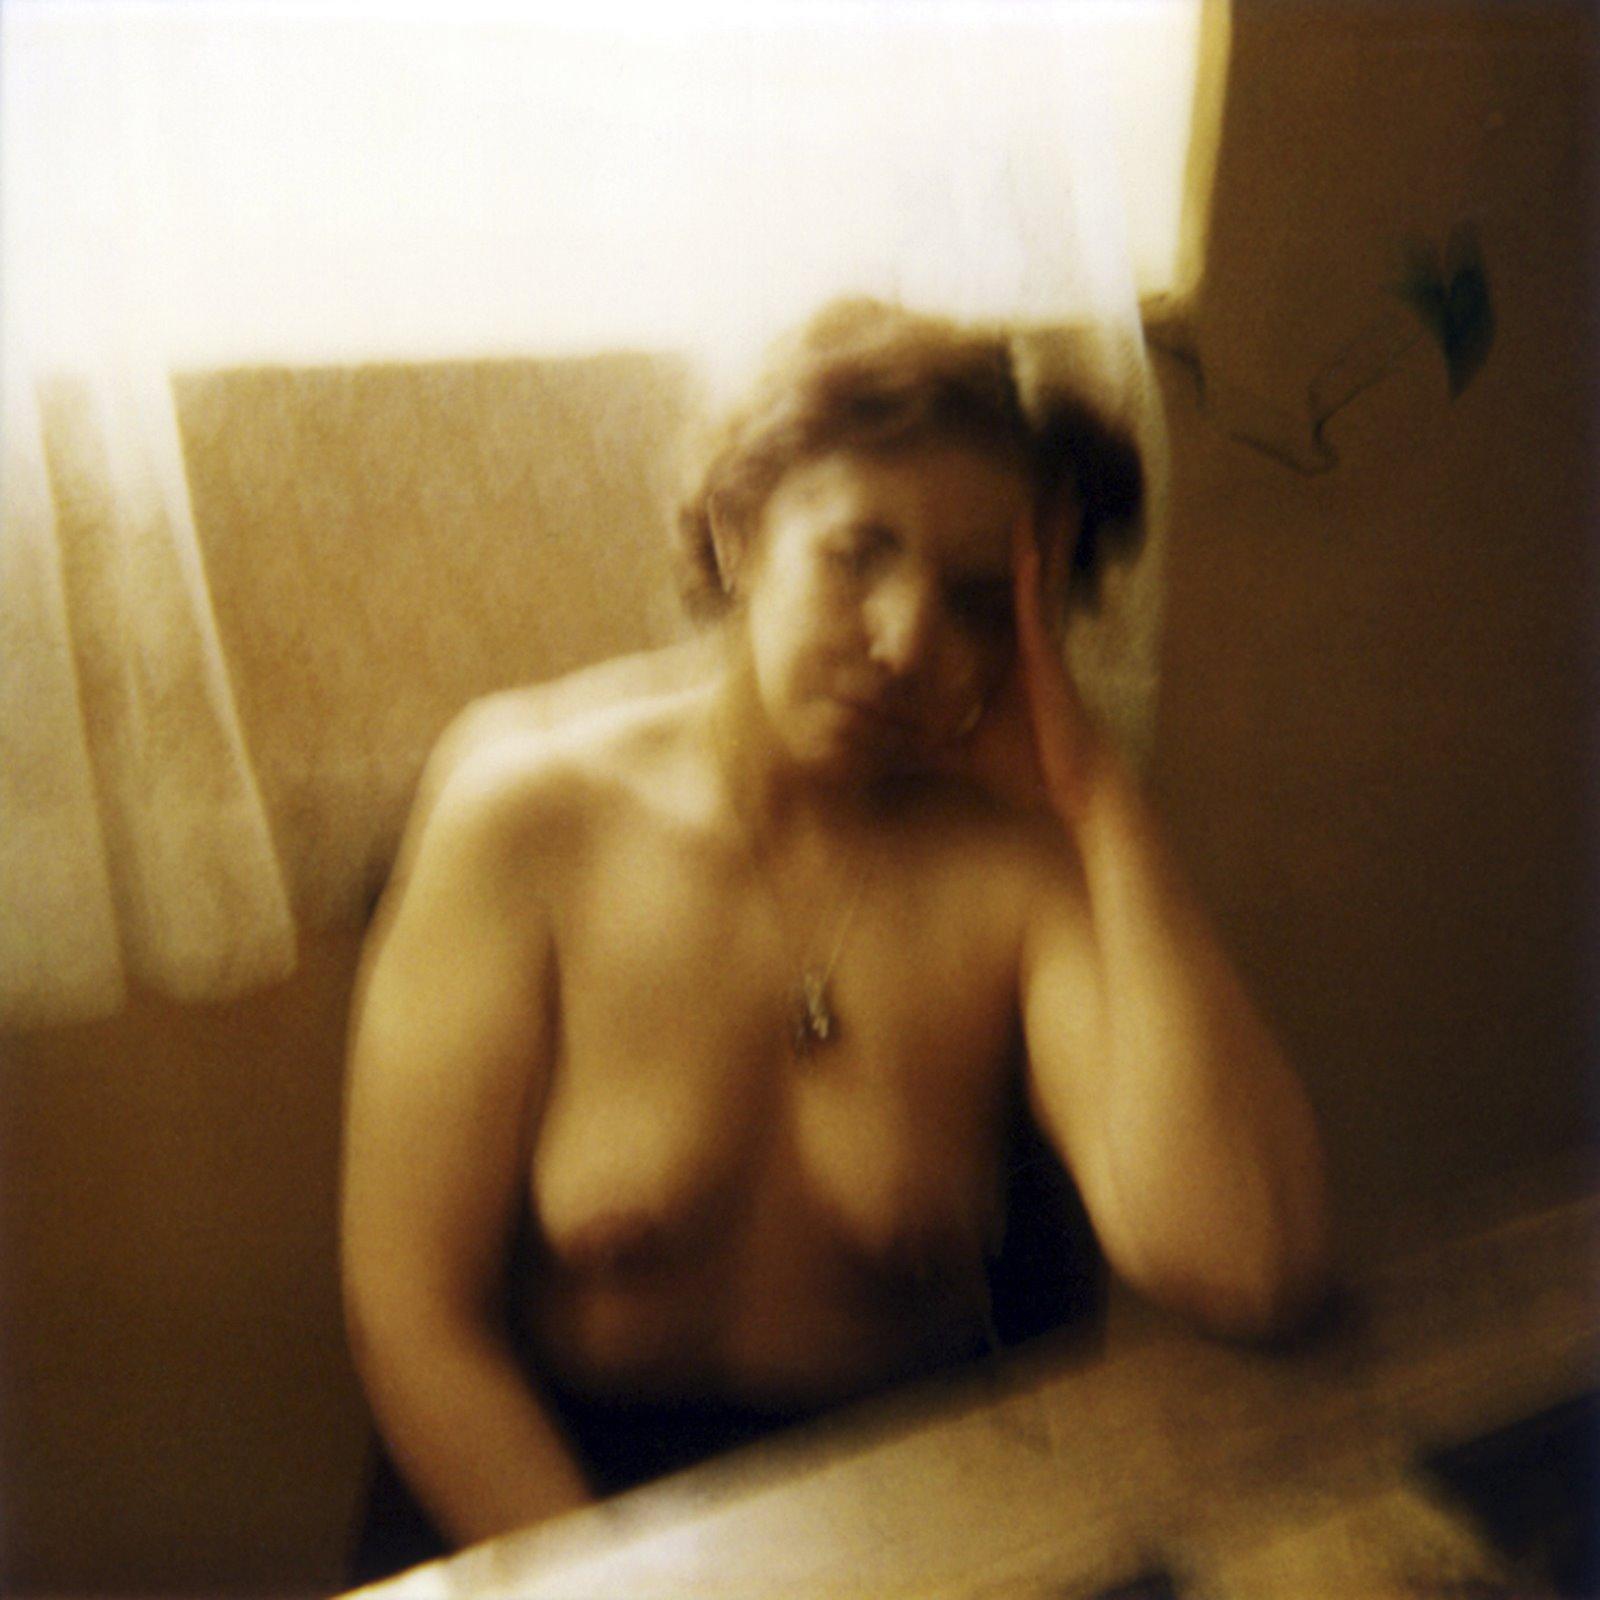 black girl butt holes nude